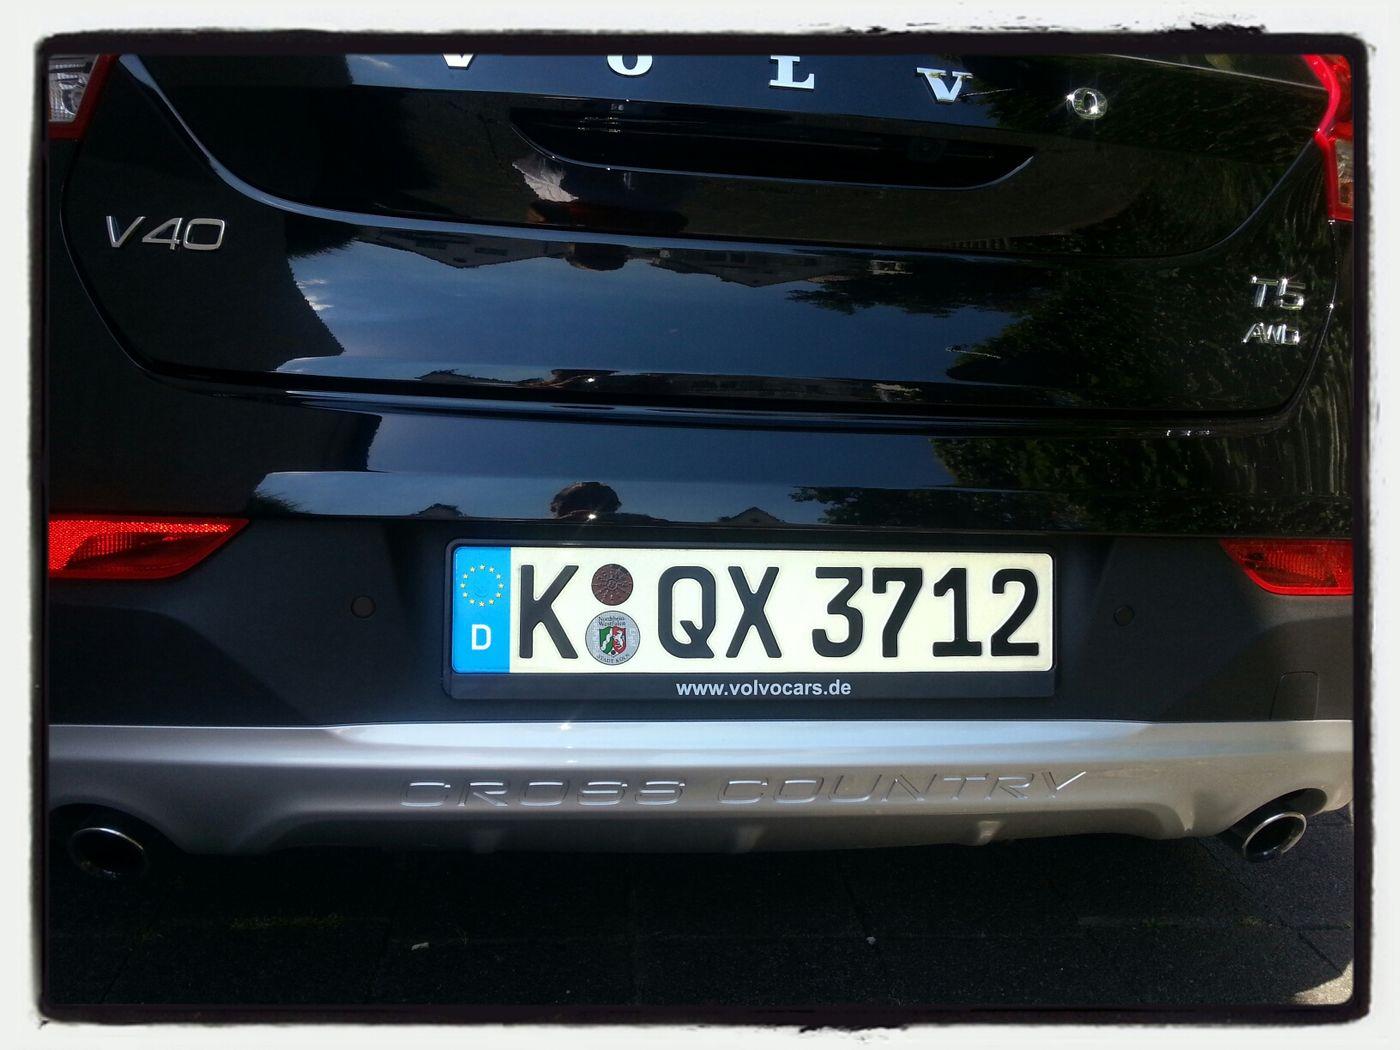 I never wanna give HIM back :-) Volvo Schlüsseltausch Volvo V40 XC